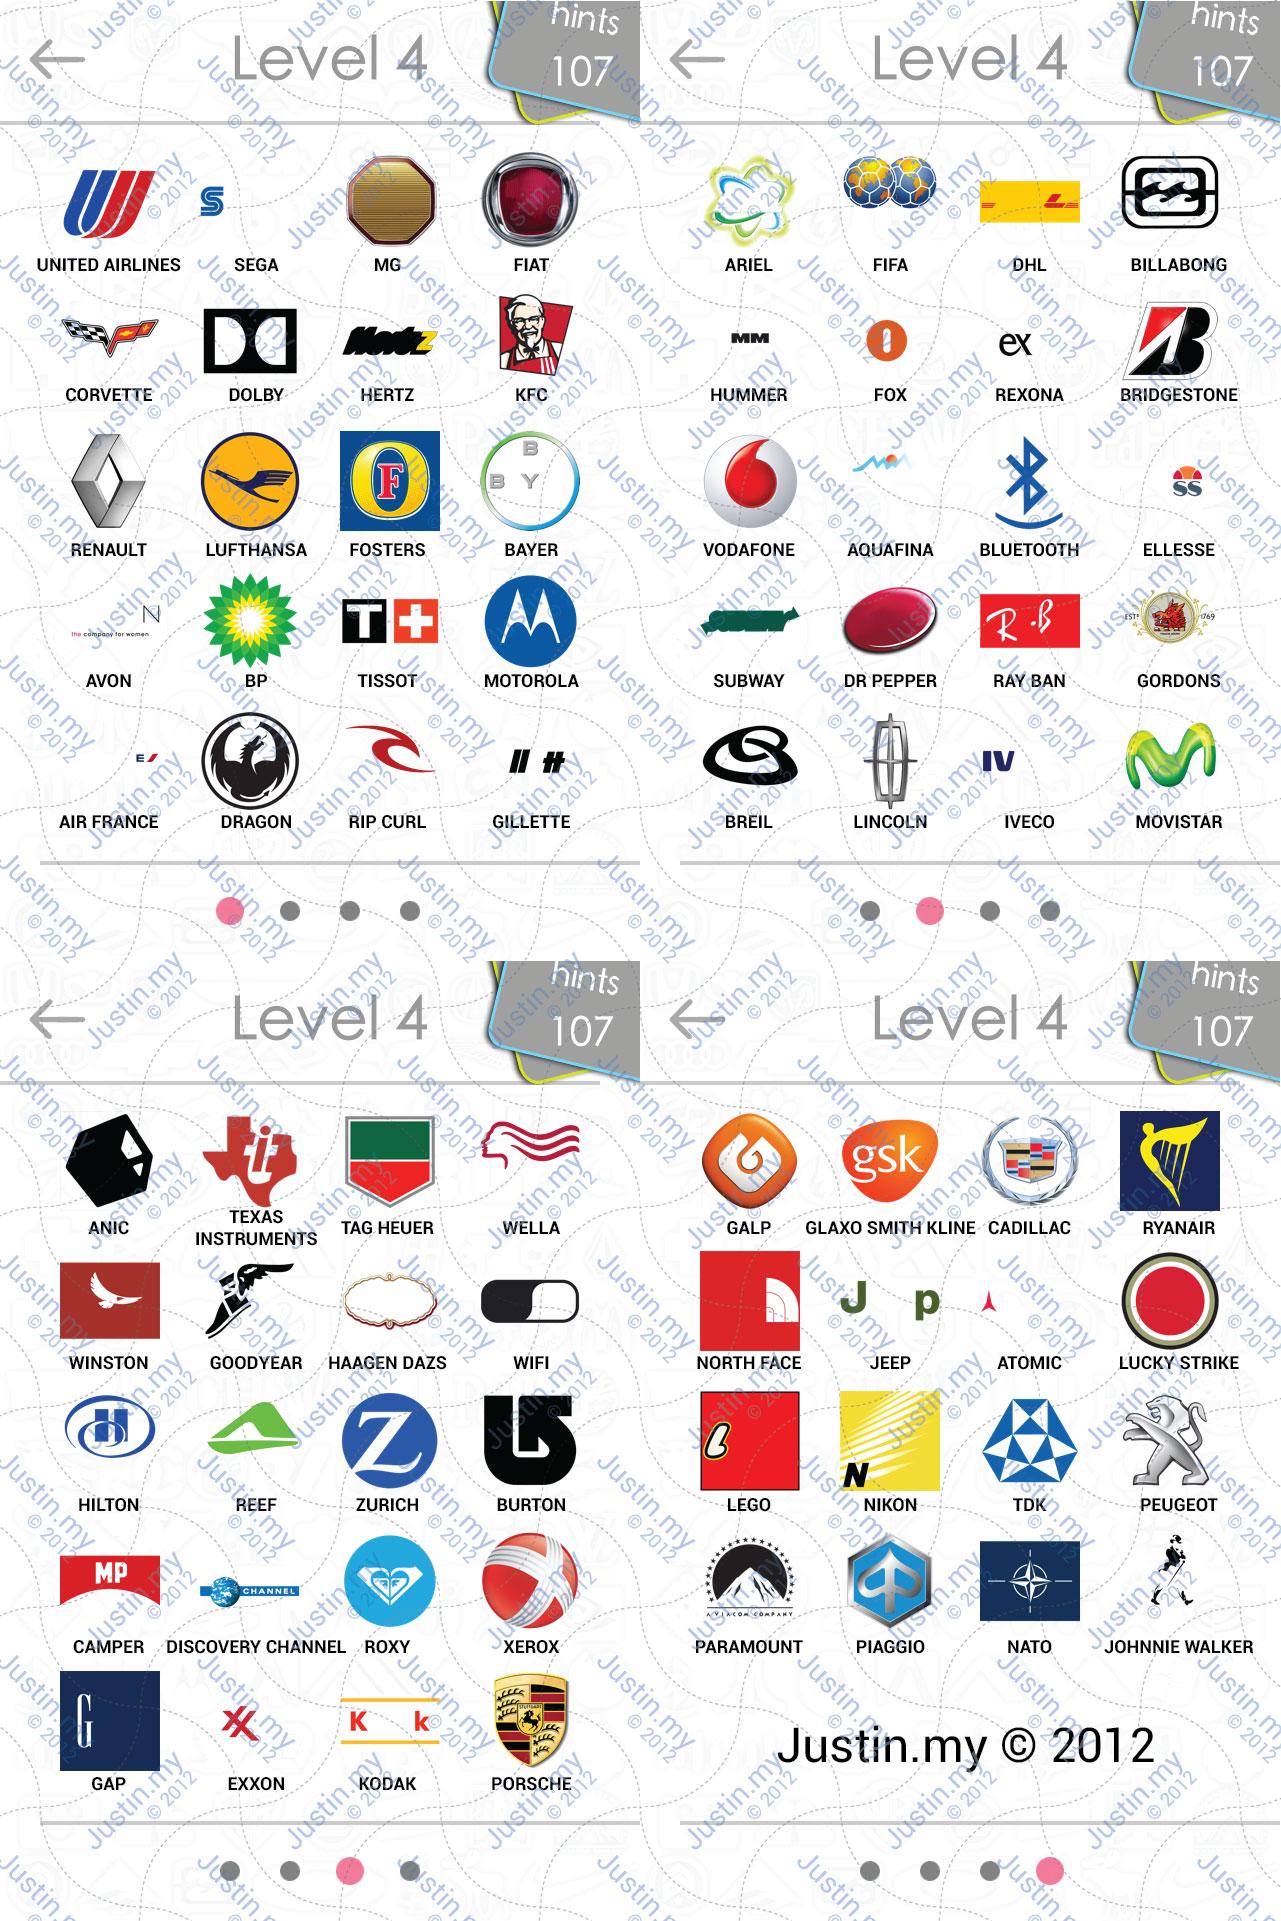 imagespace logo quiz 2 answers level 4 facebook